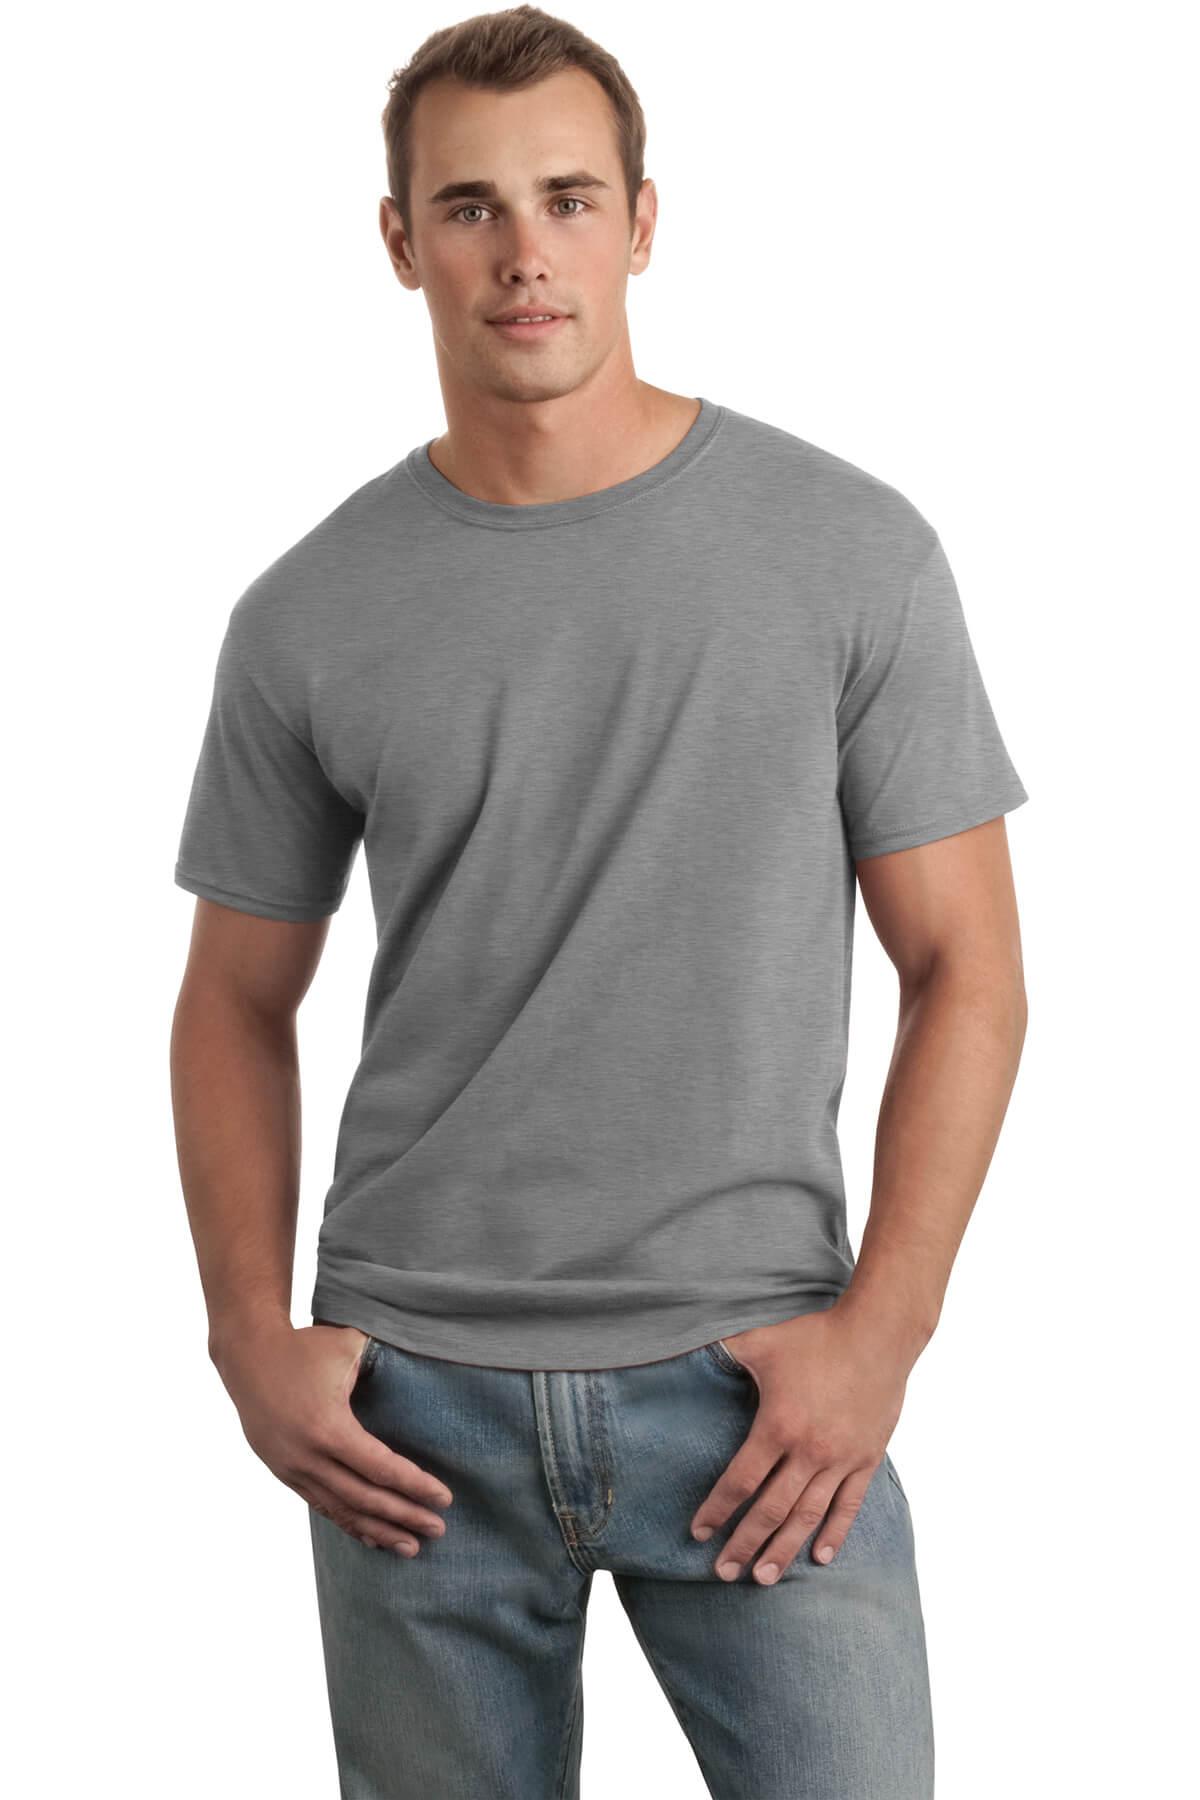 Sport Grey T-Shirt Model Front